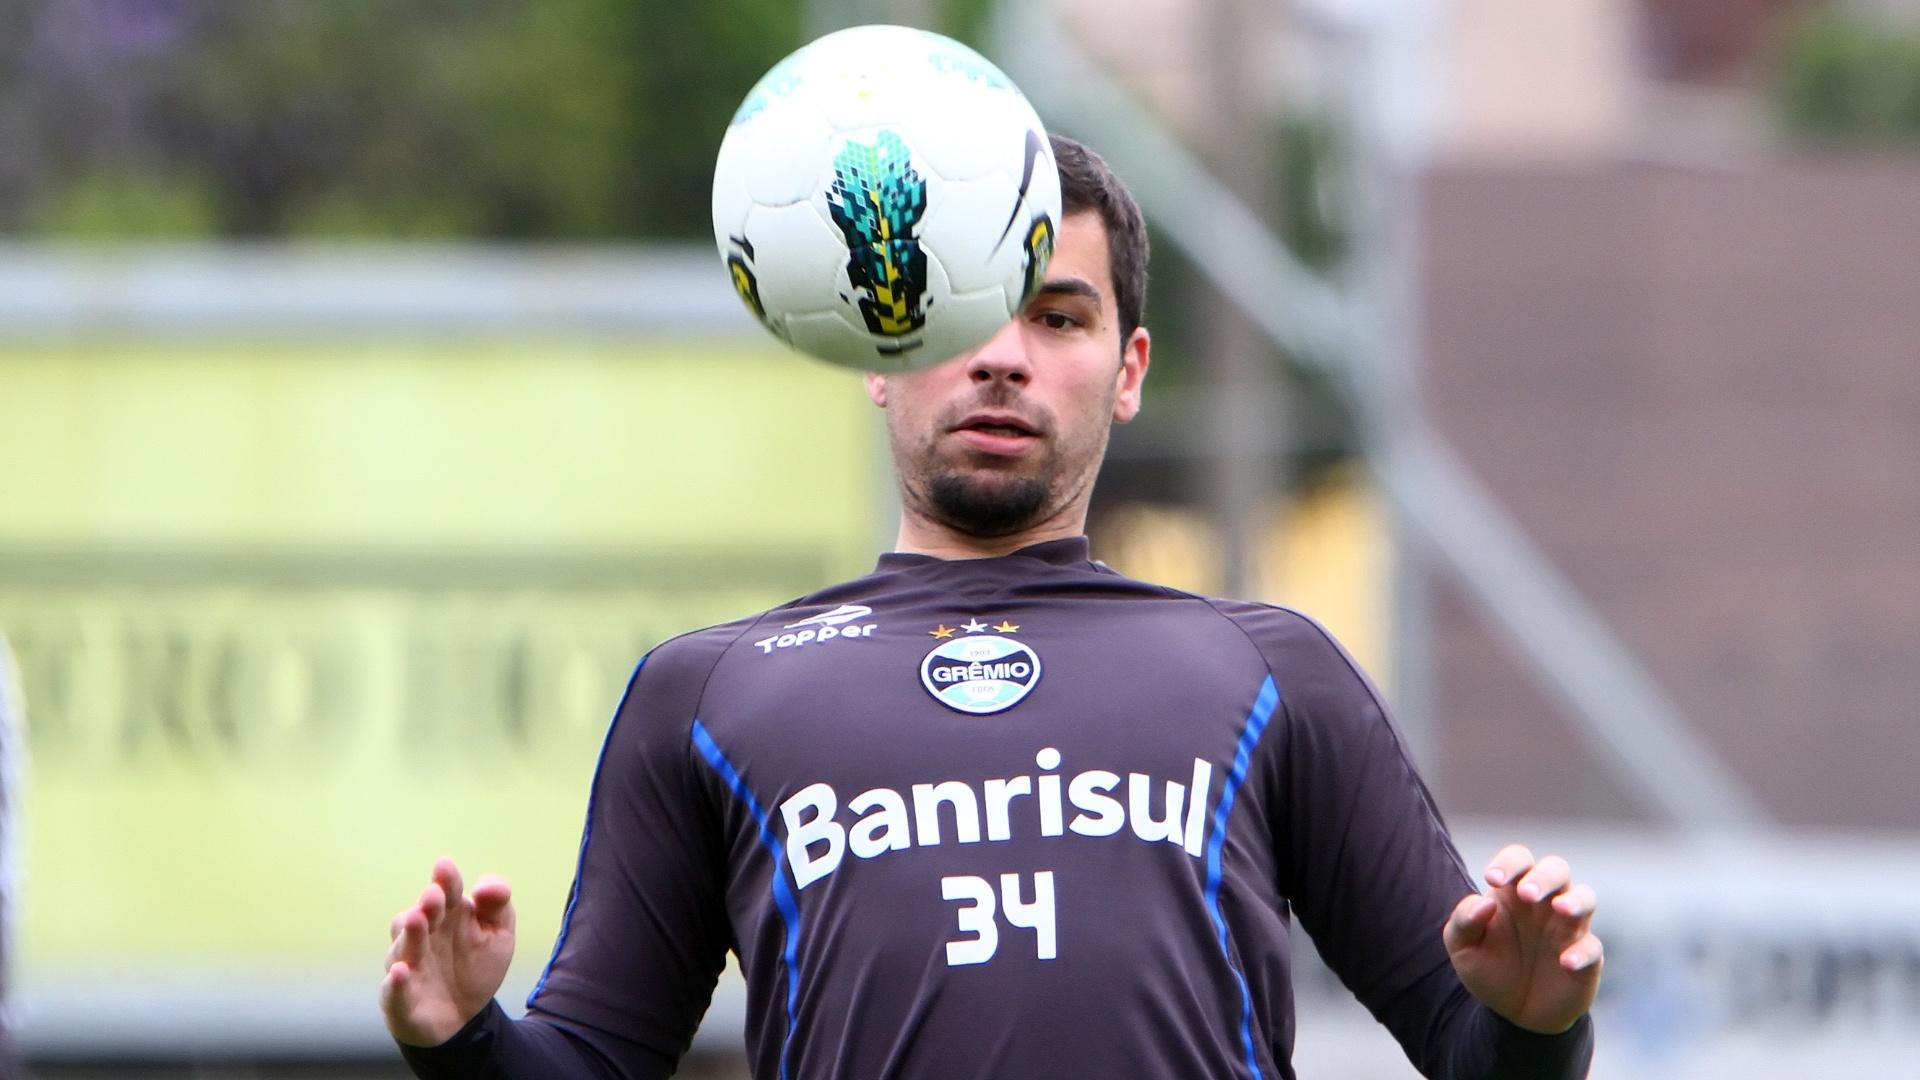 Atacante André Lima controla a bola durante treino do Grêmio (4/10/2012)